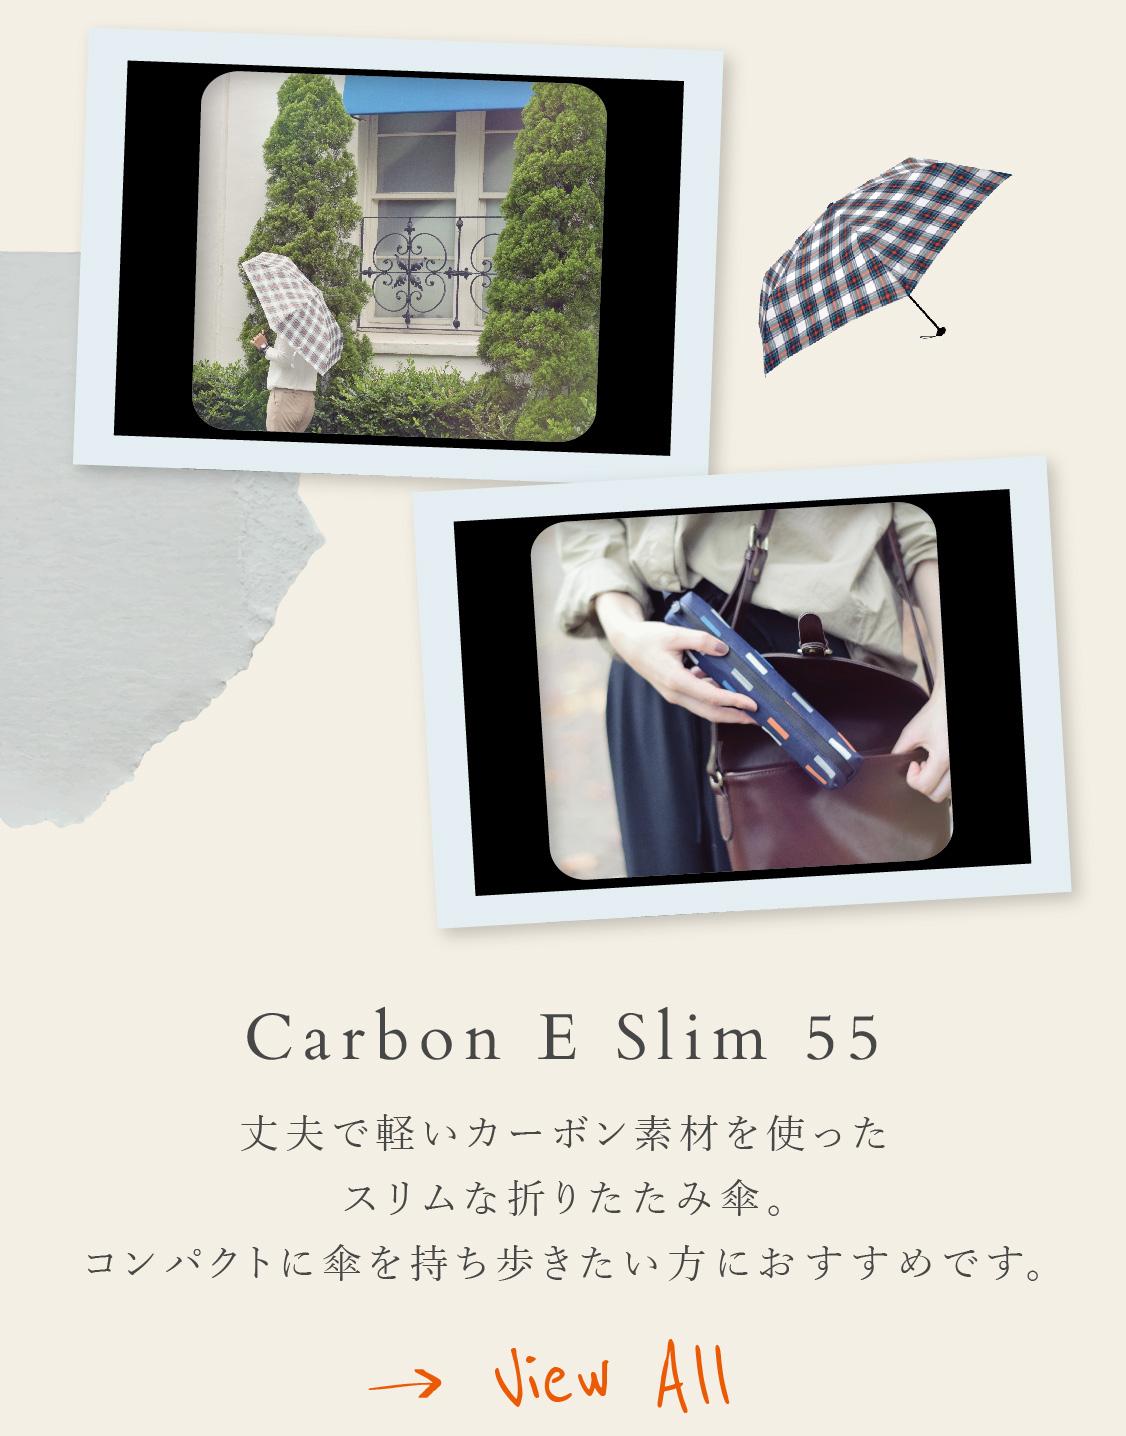 CarbonESlim55